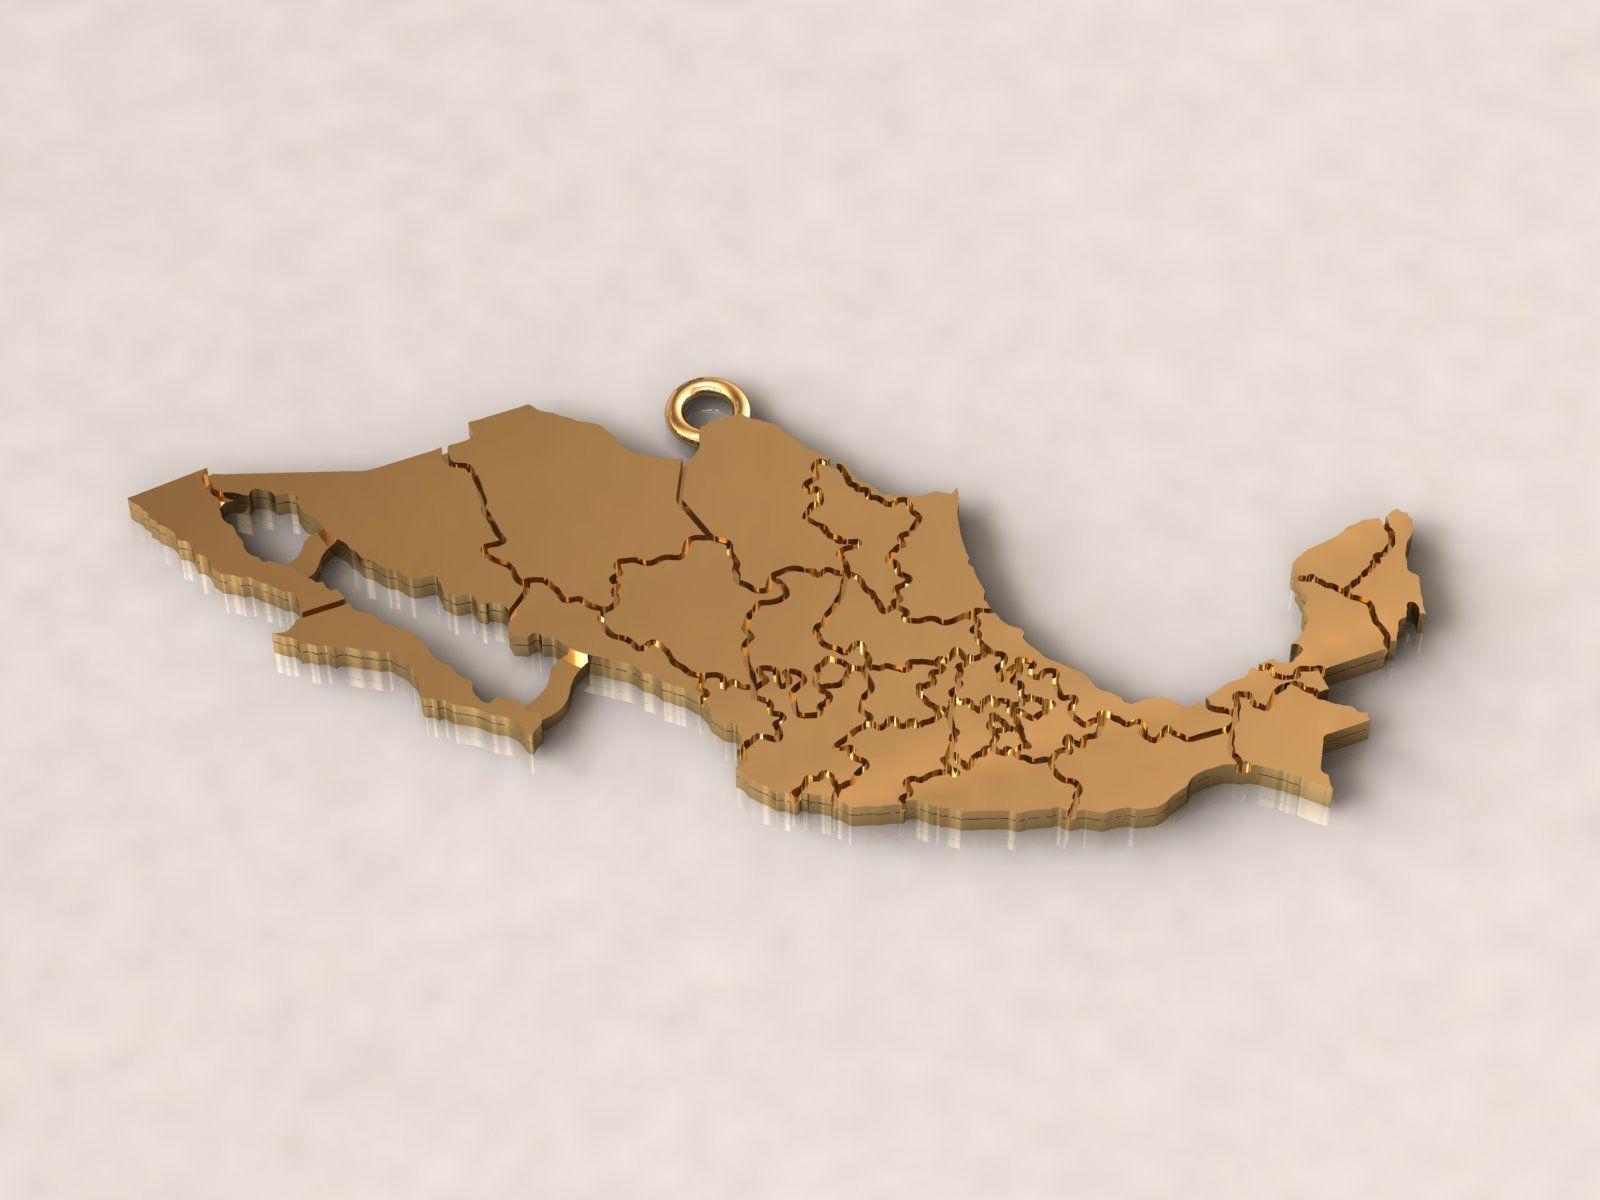 Mexico Map Charm Pendant